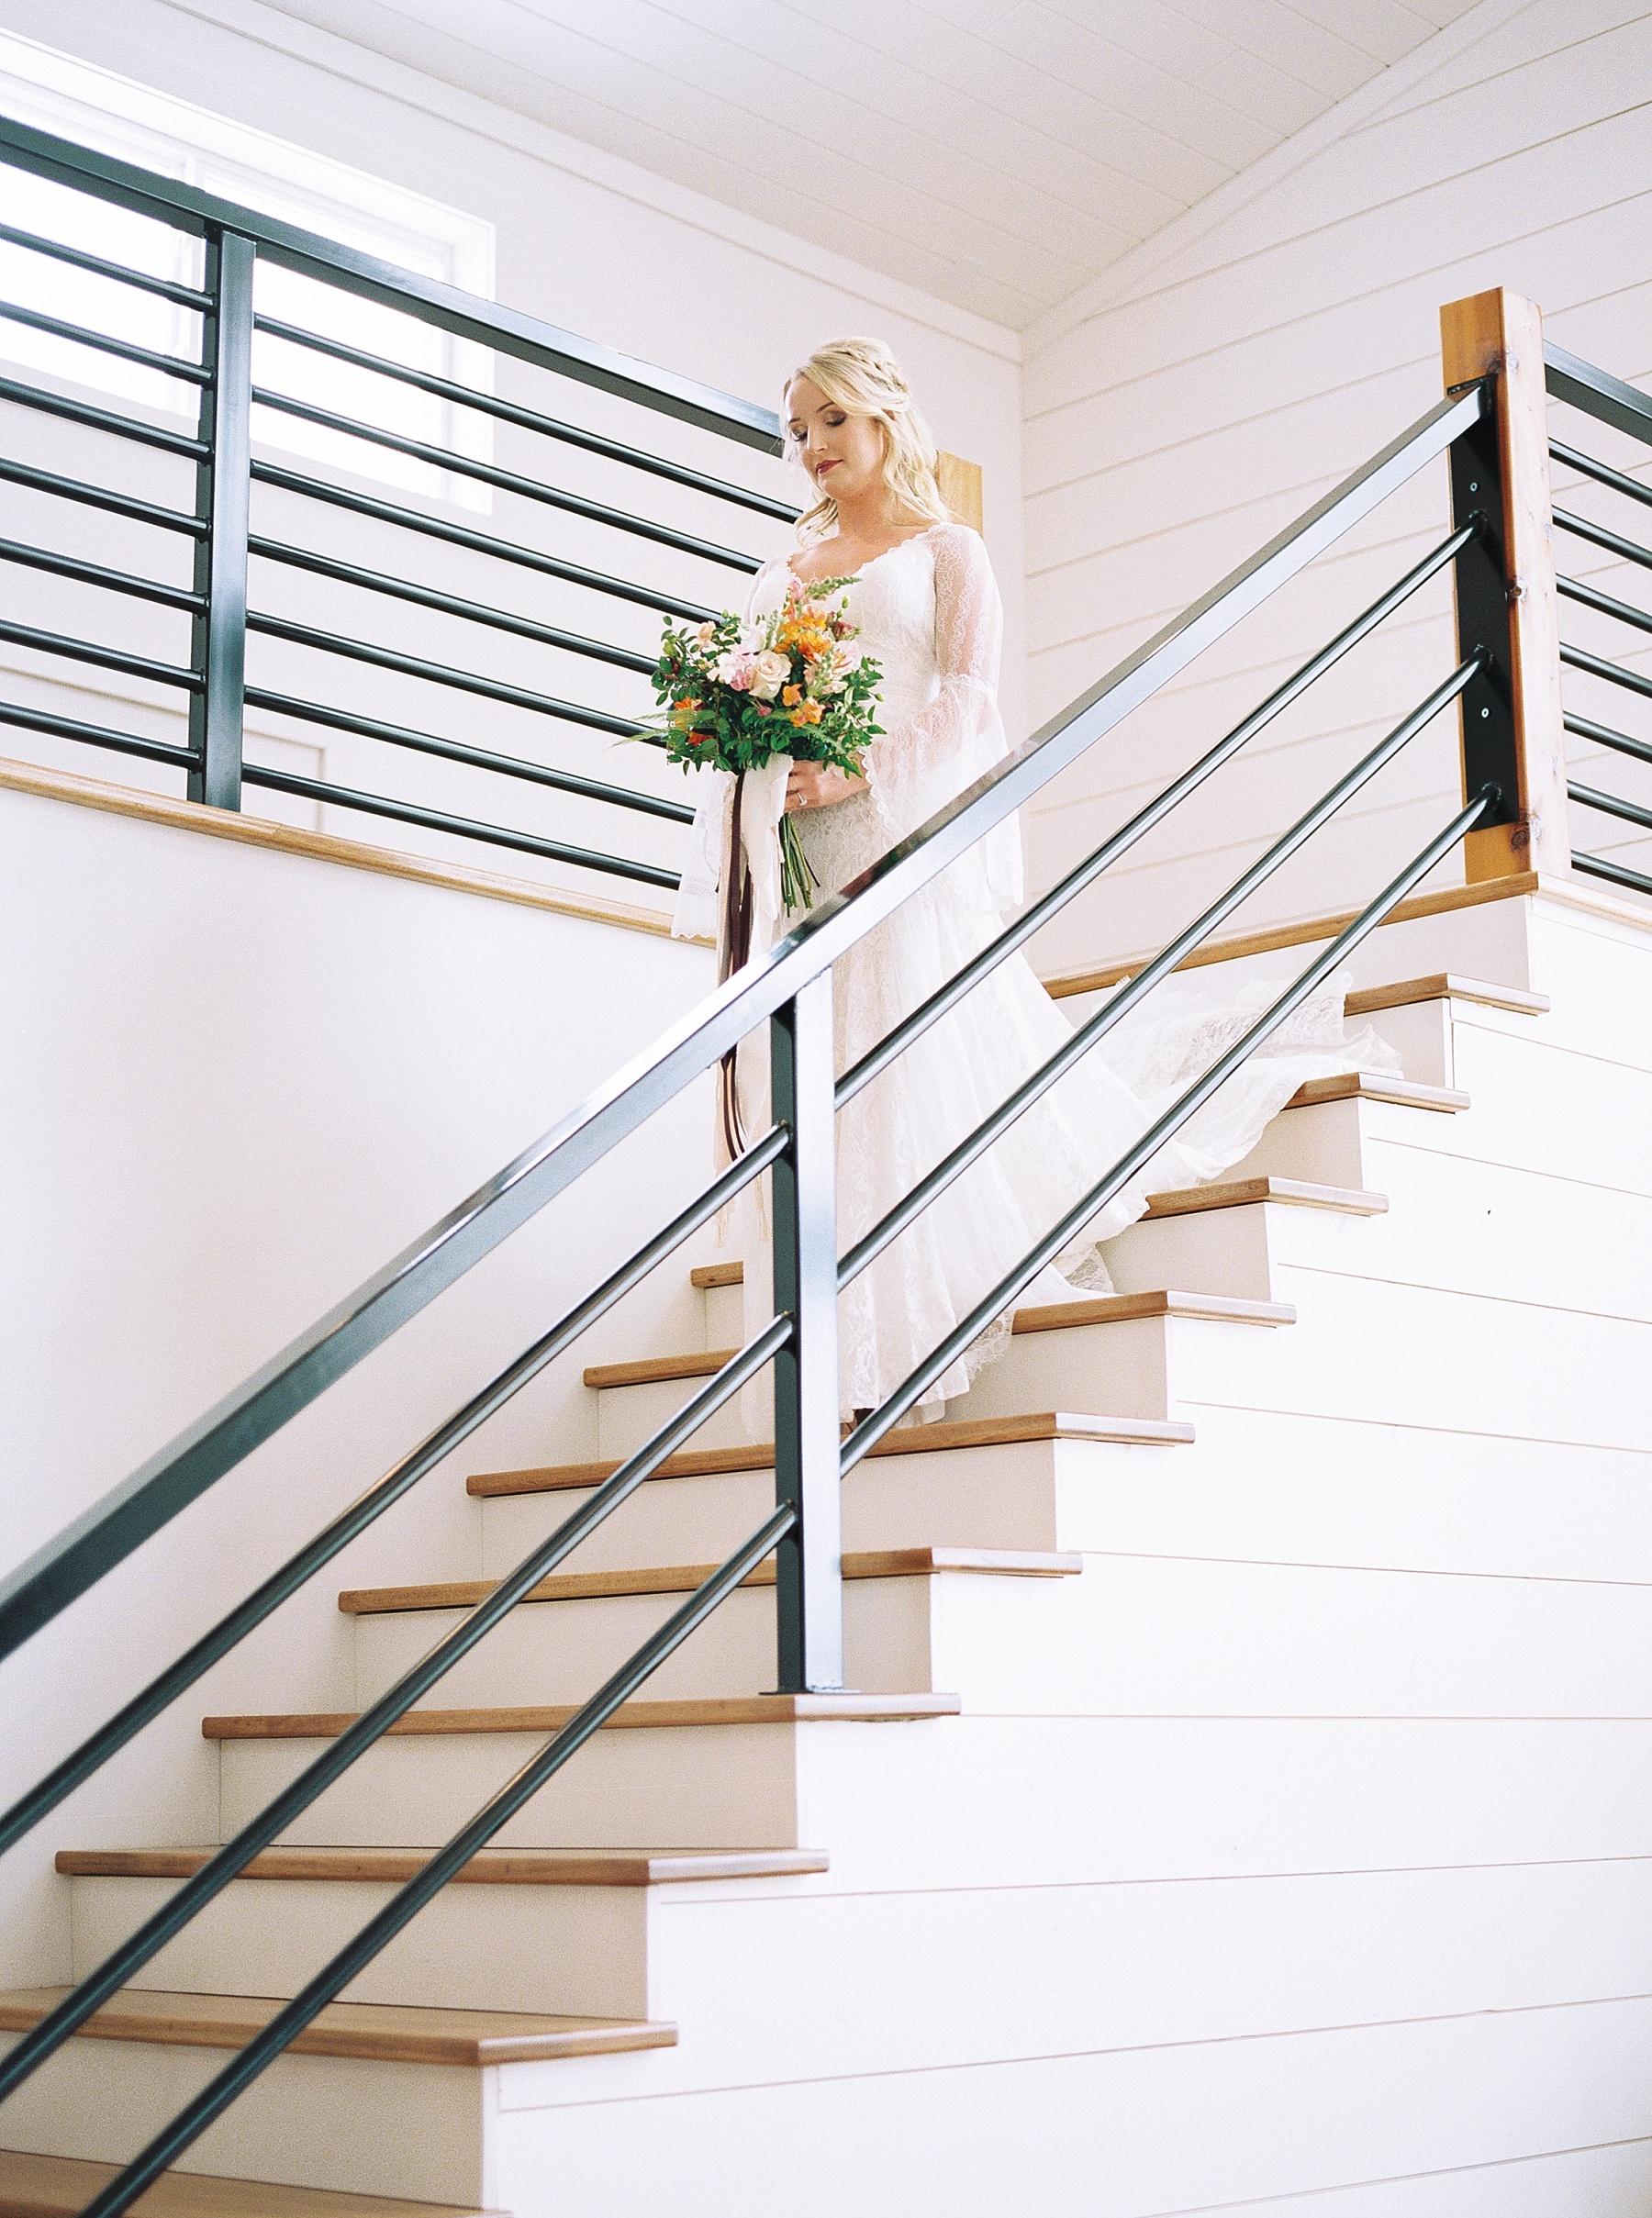 Eclectic Scandinavian Winter Wedding in All White Venue Emerson Fields by Kelsi Kliethermes Photography Best Missouri and Maui Wedding Photographer_0071.jpg